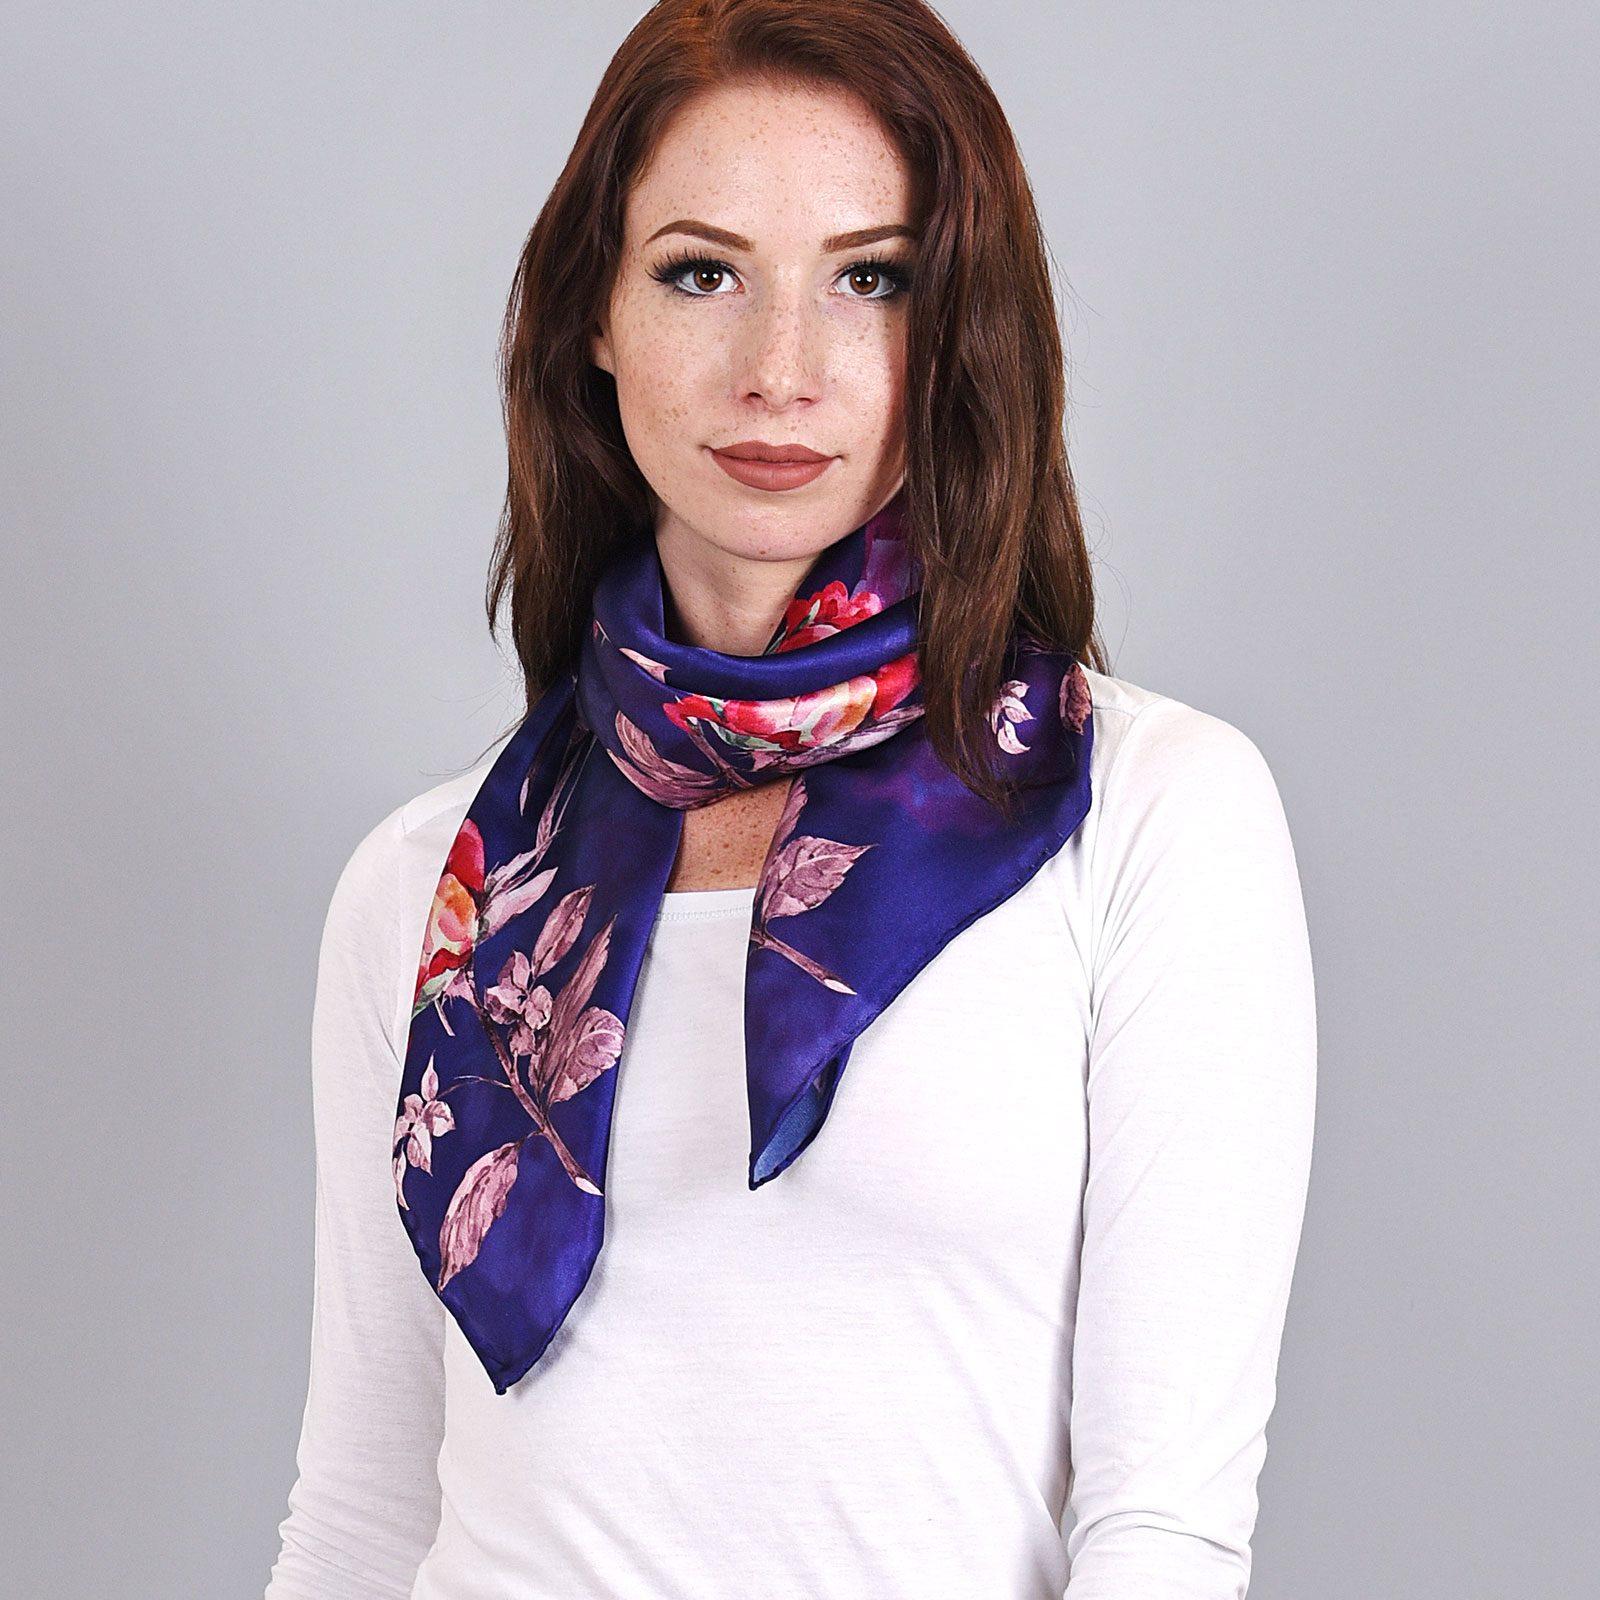 http://lookbook.allee-du-foulard.fr/wp-content/uploads/2018/09/AT-04039-VF16-carre-soie-fleurs-sur-bleu-1600x1600.jpg